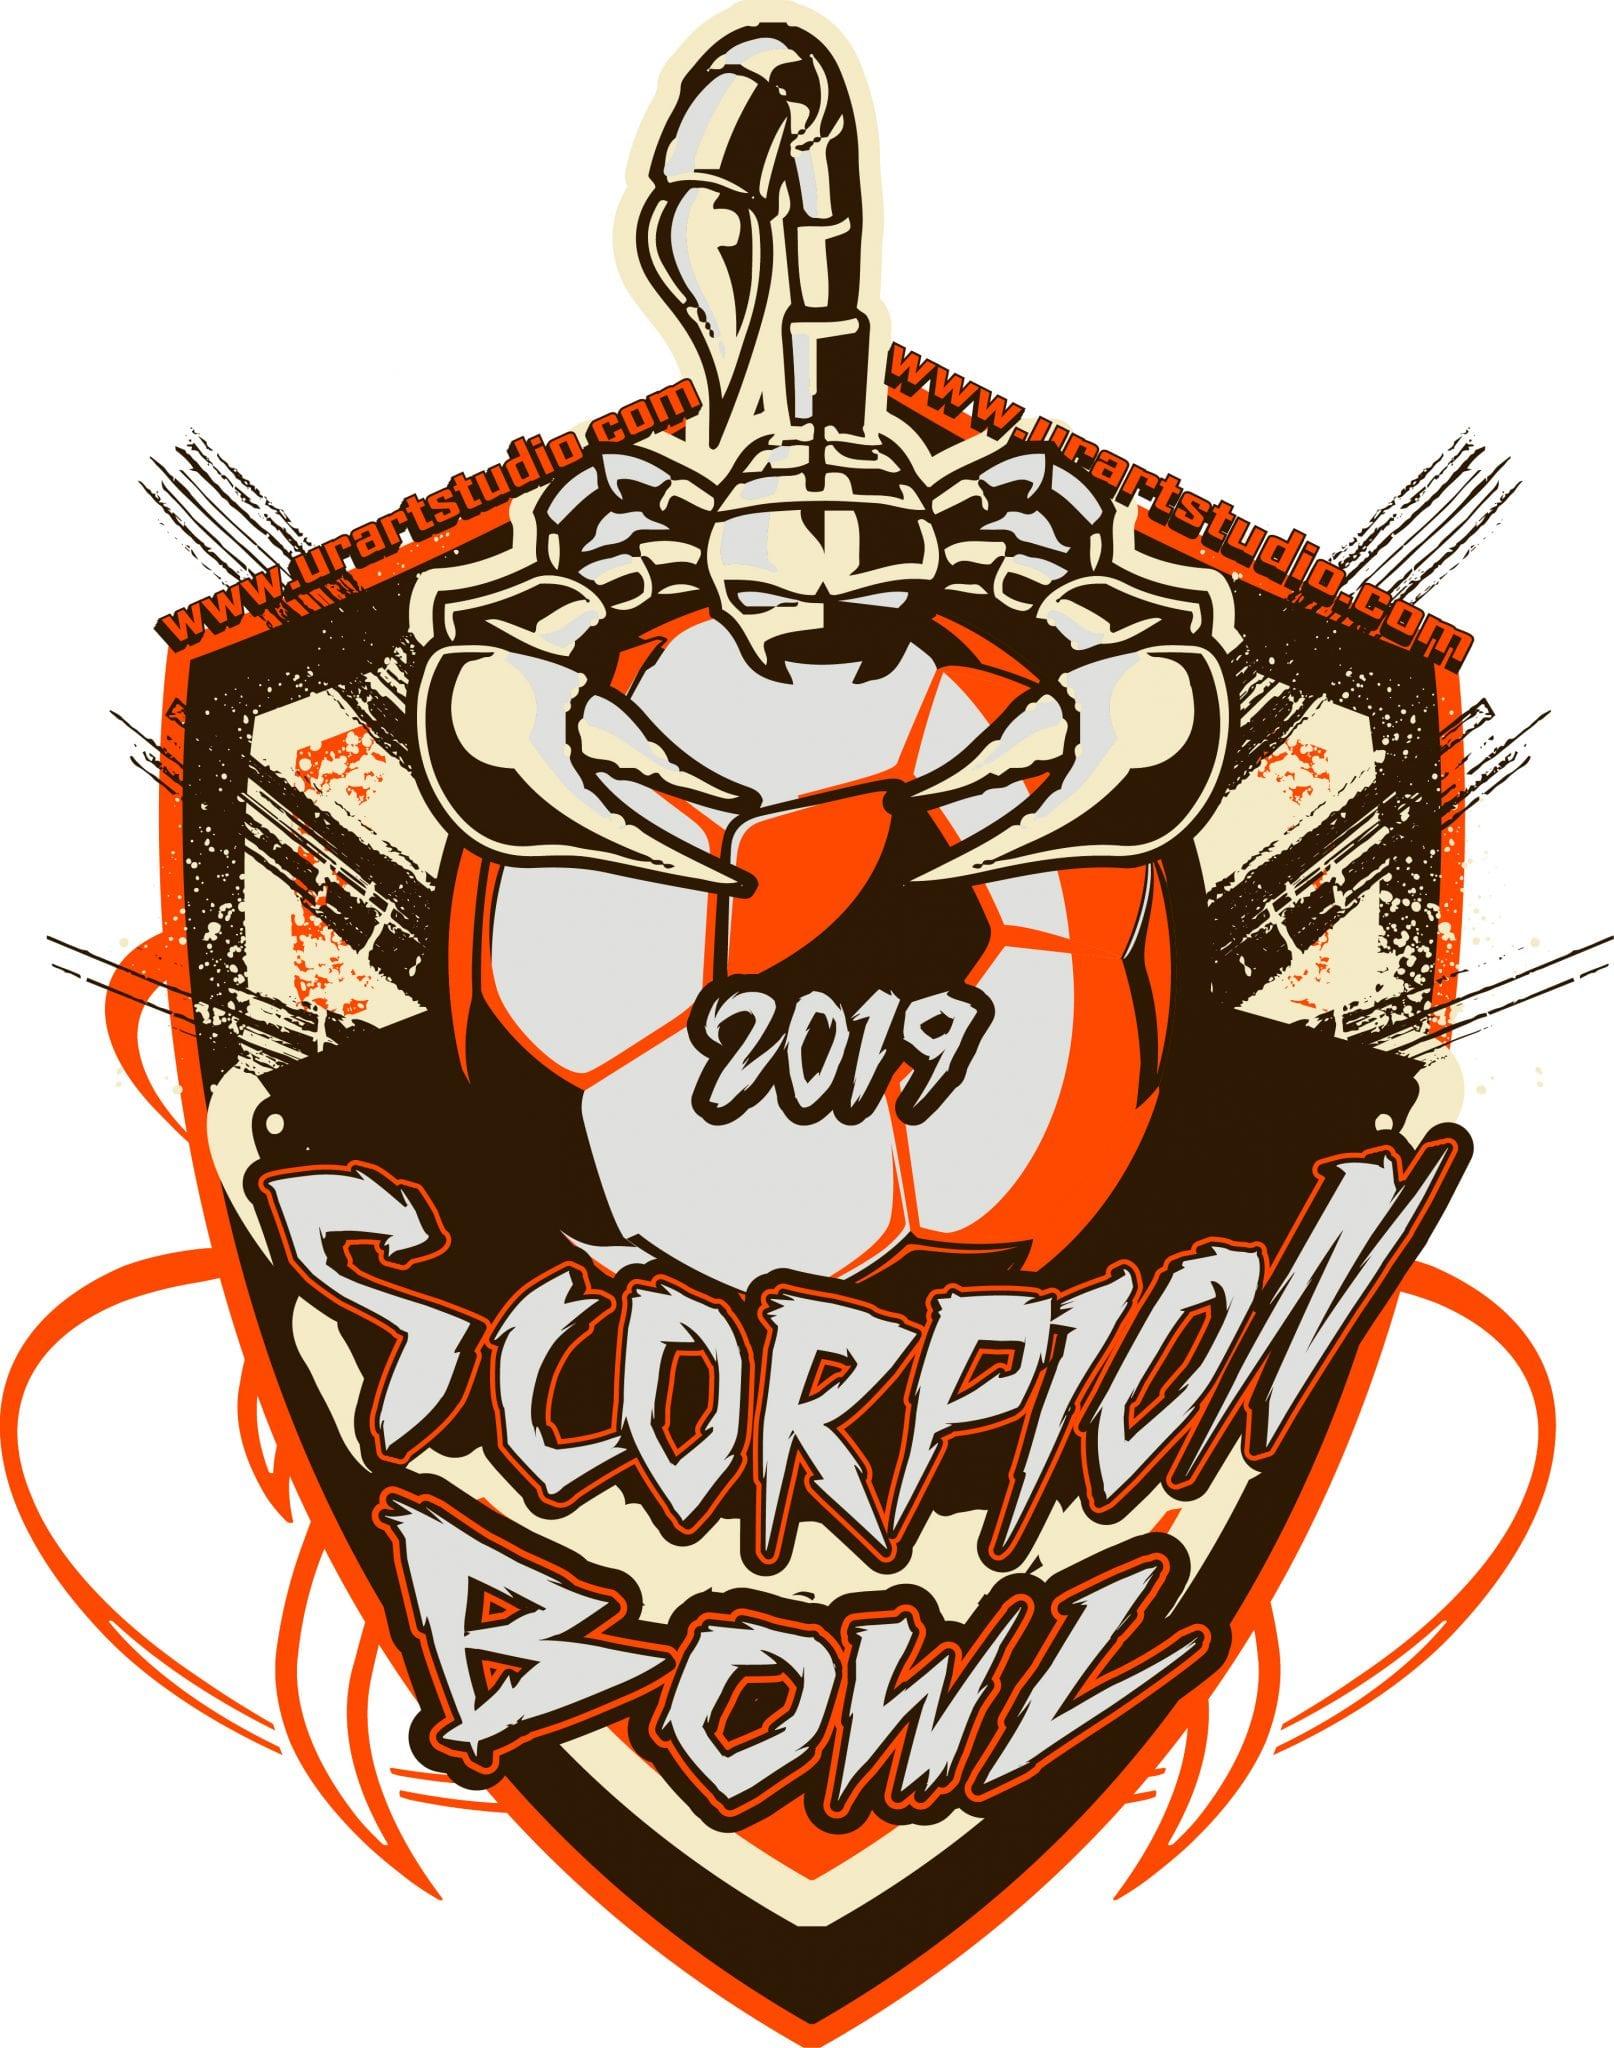 SCORPION-BOWL-SOCCER-customizable-T-shirt-vector-logo-design-for-print-2019